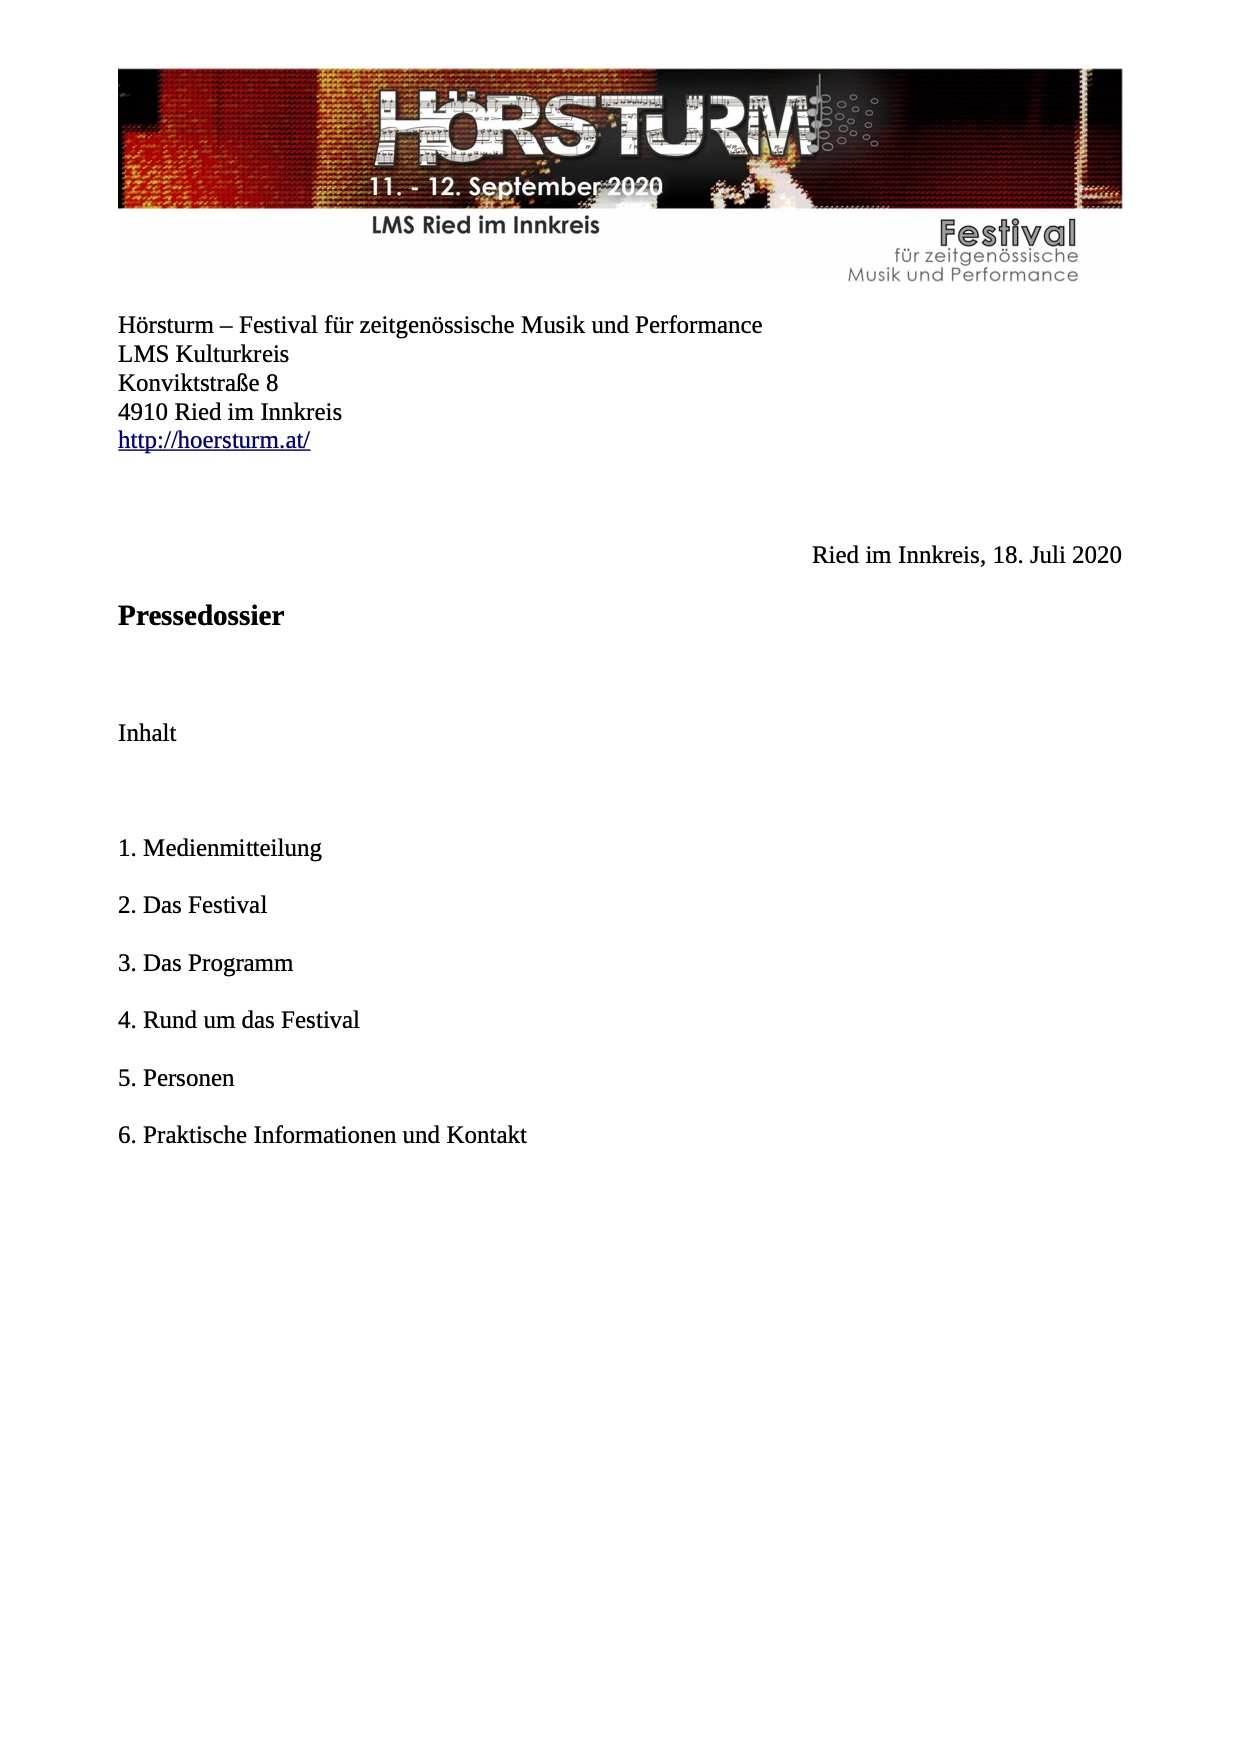 Pressedossier-2020